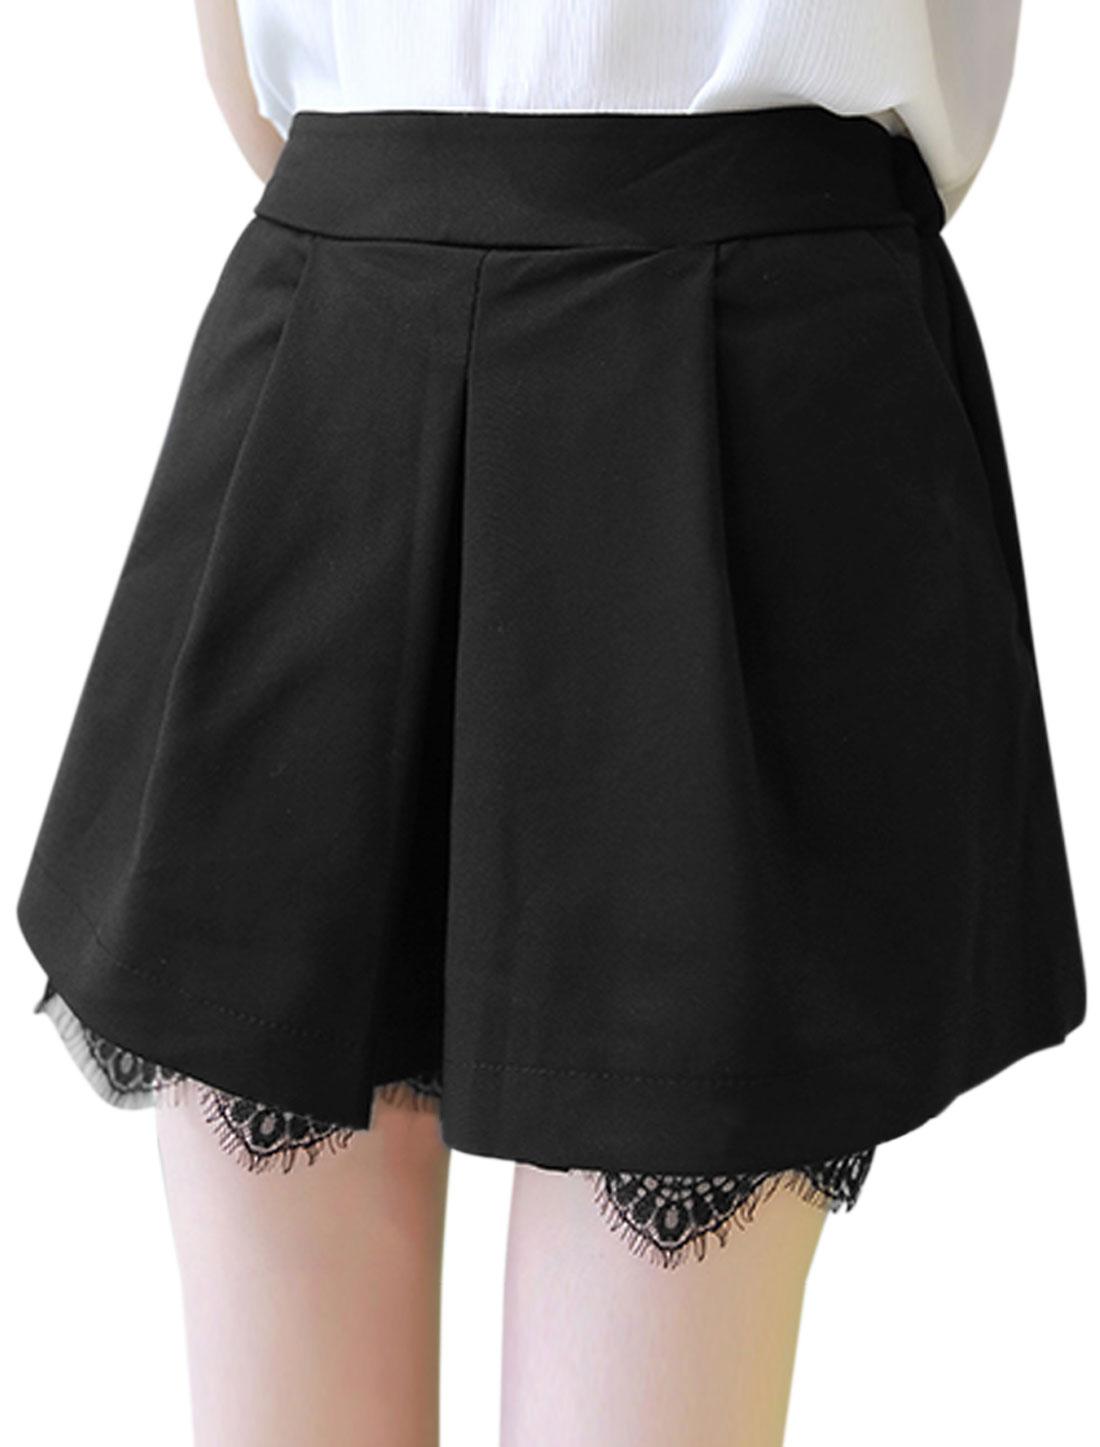 Women Lace Panel Cuffs Elasticized Waist Back Short Shorts Black S